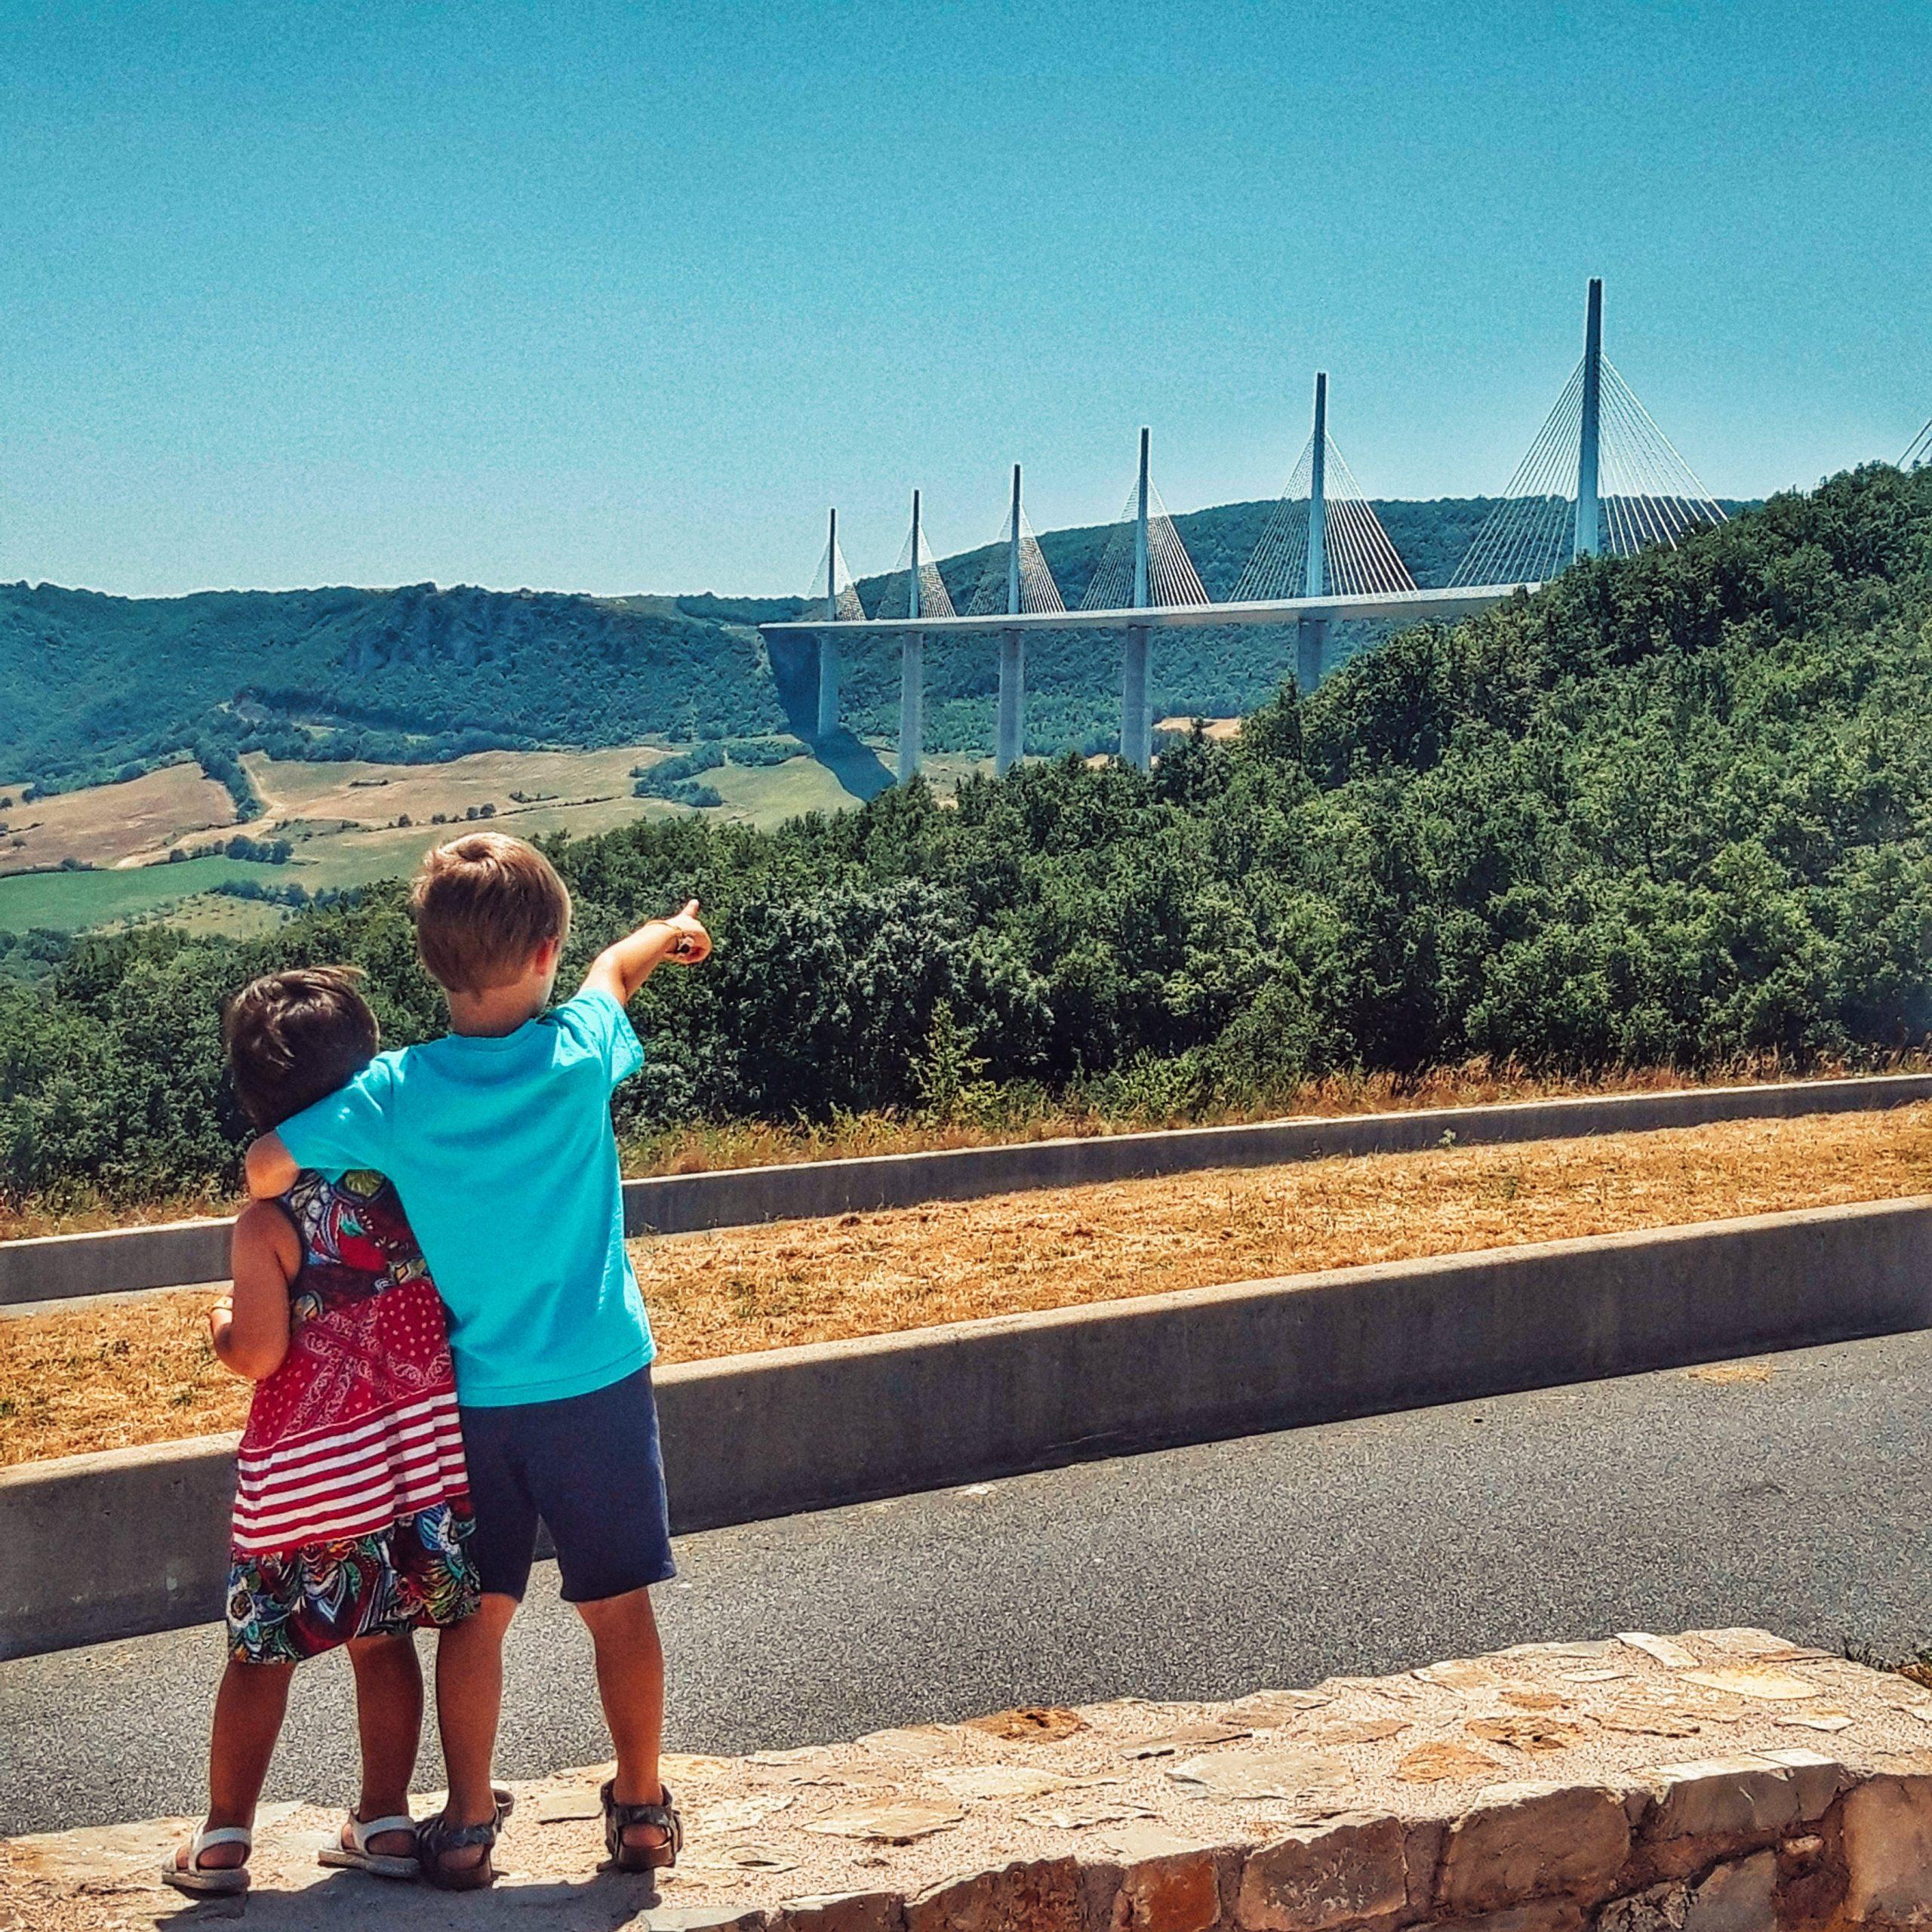 Parque Natural Quercy, una ruta por Francia en autocaravana